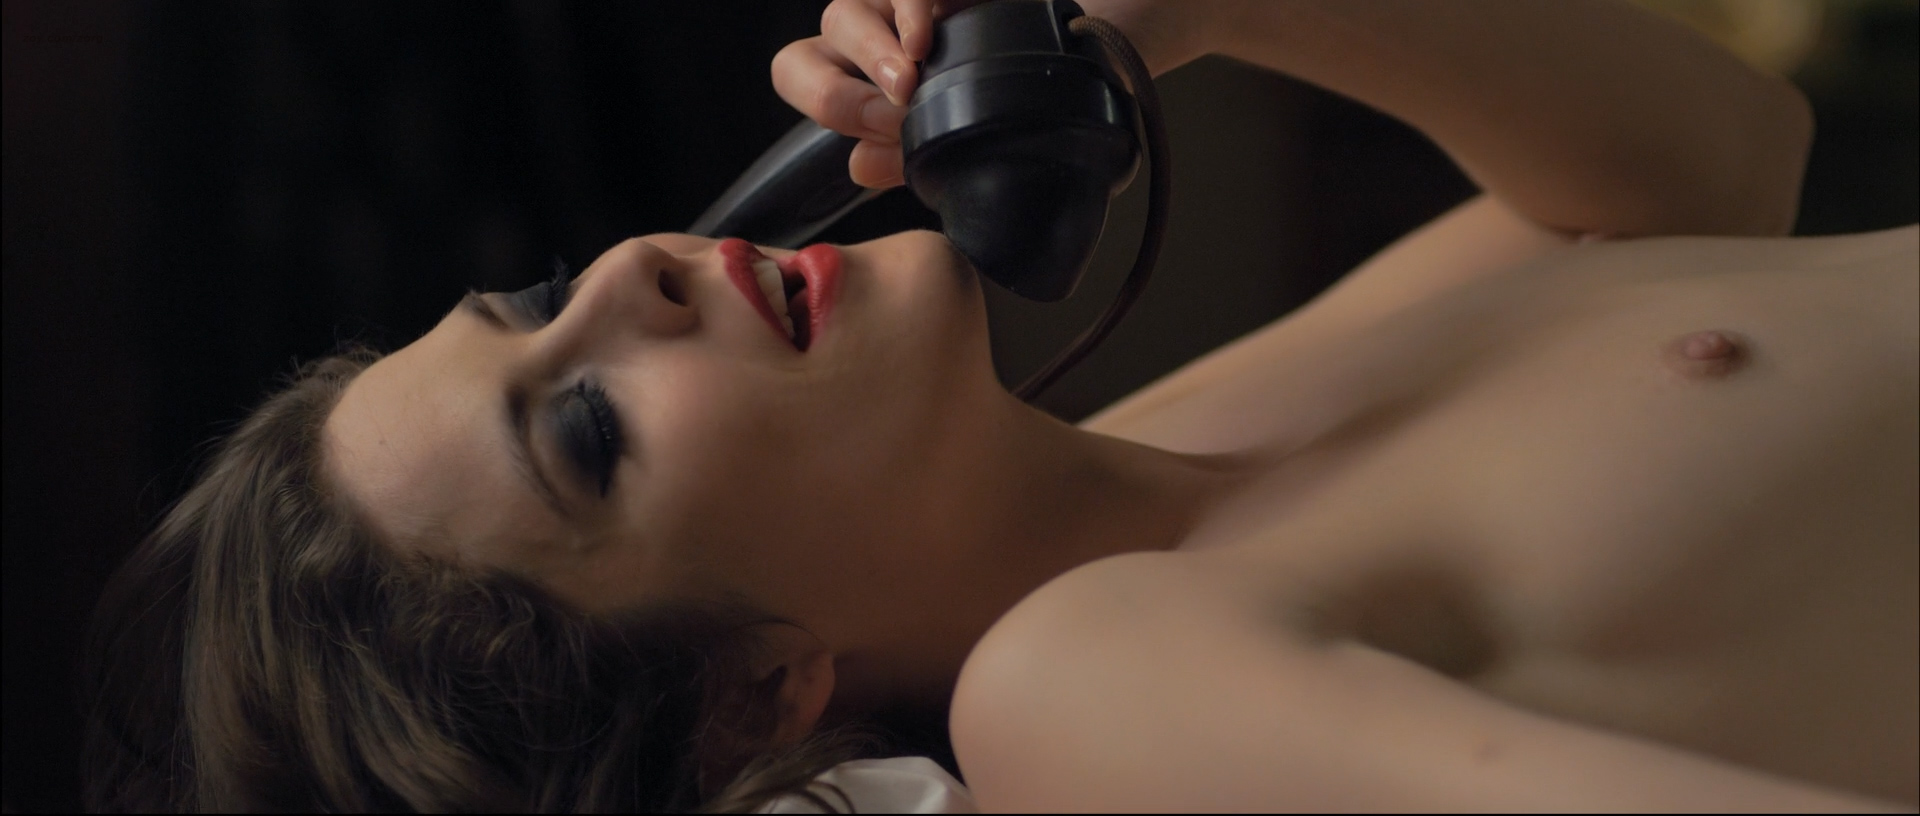 Elizabeth henstridge sex scene